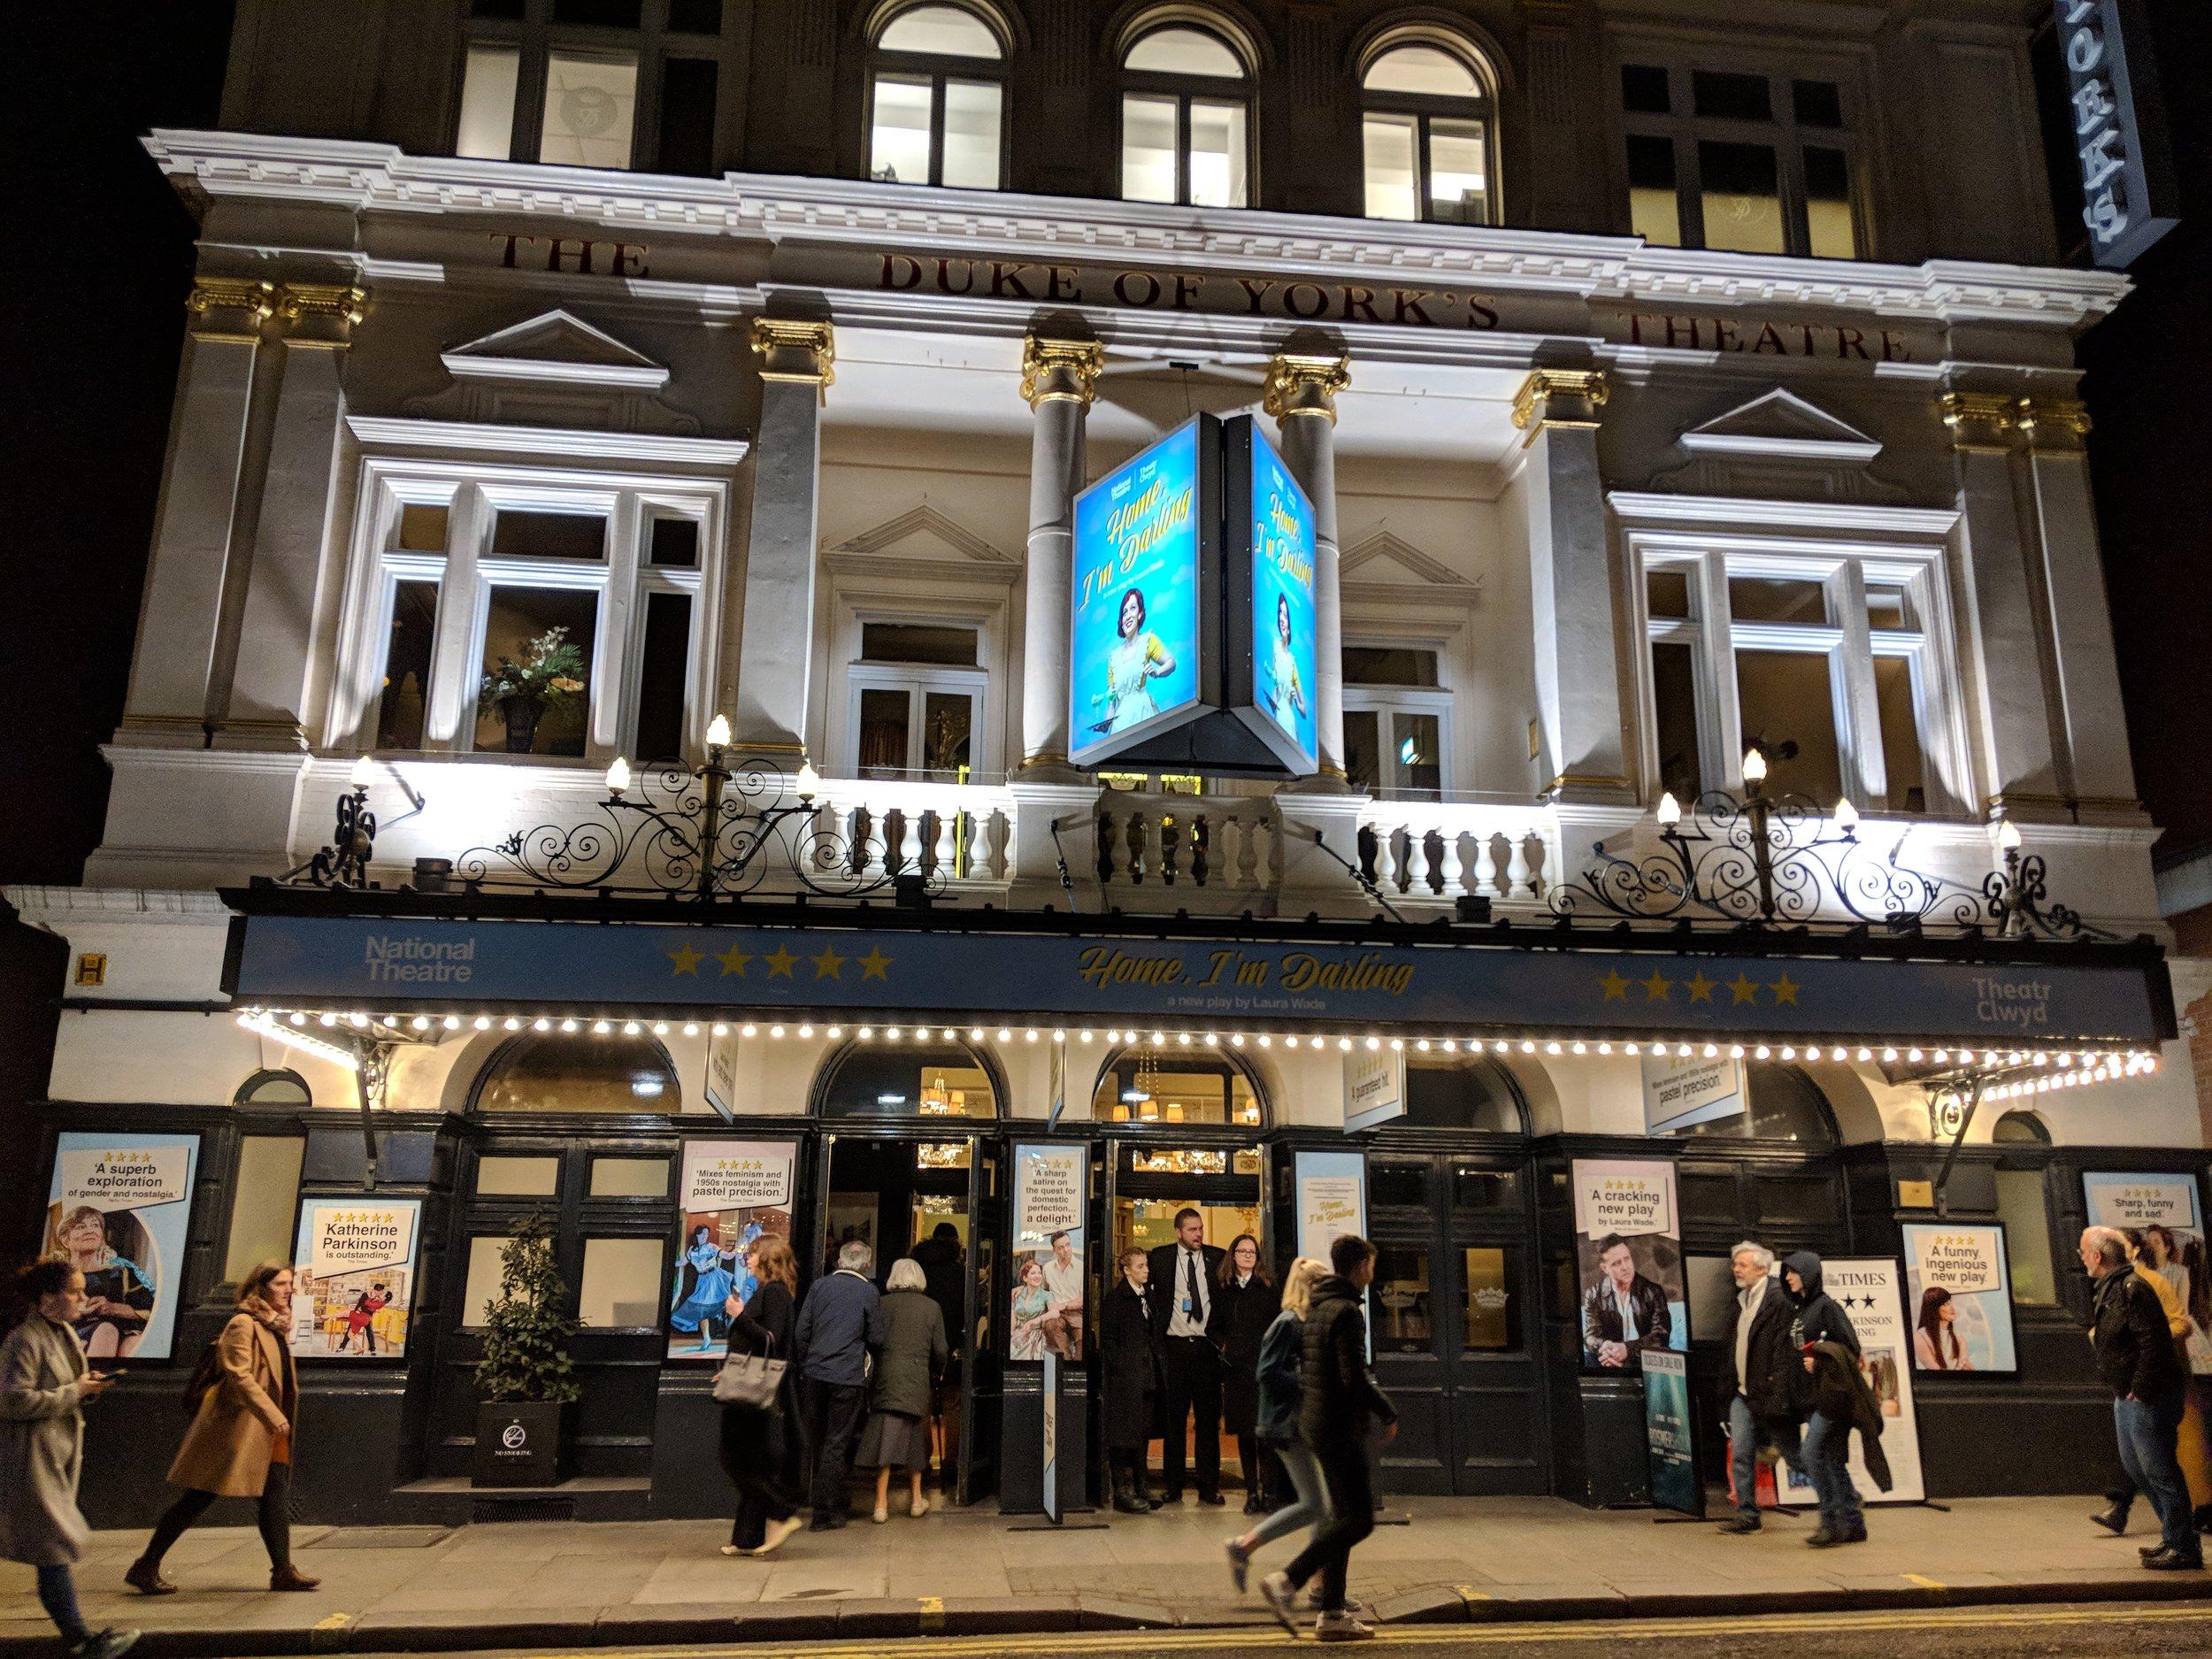 Duke of York's Theatre - visited 28/02/2019